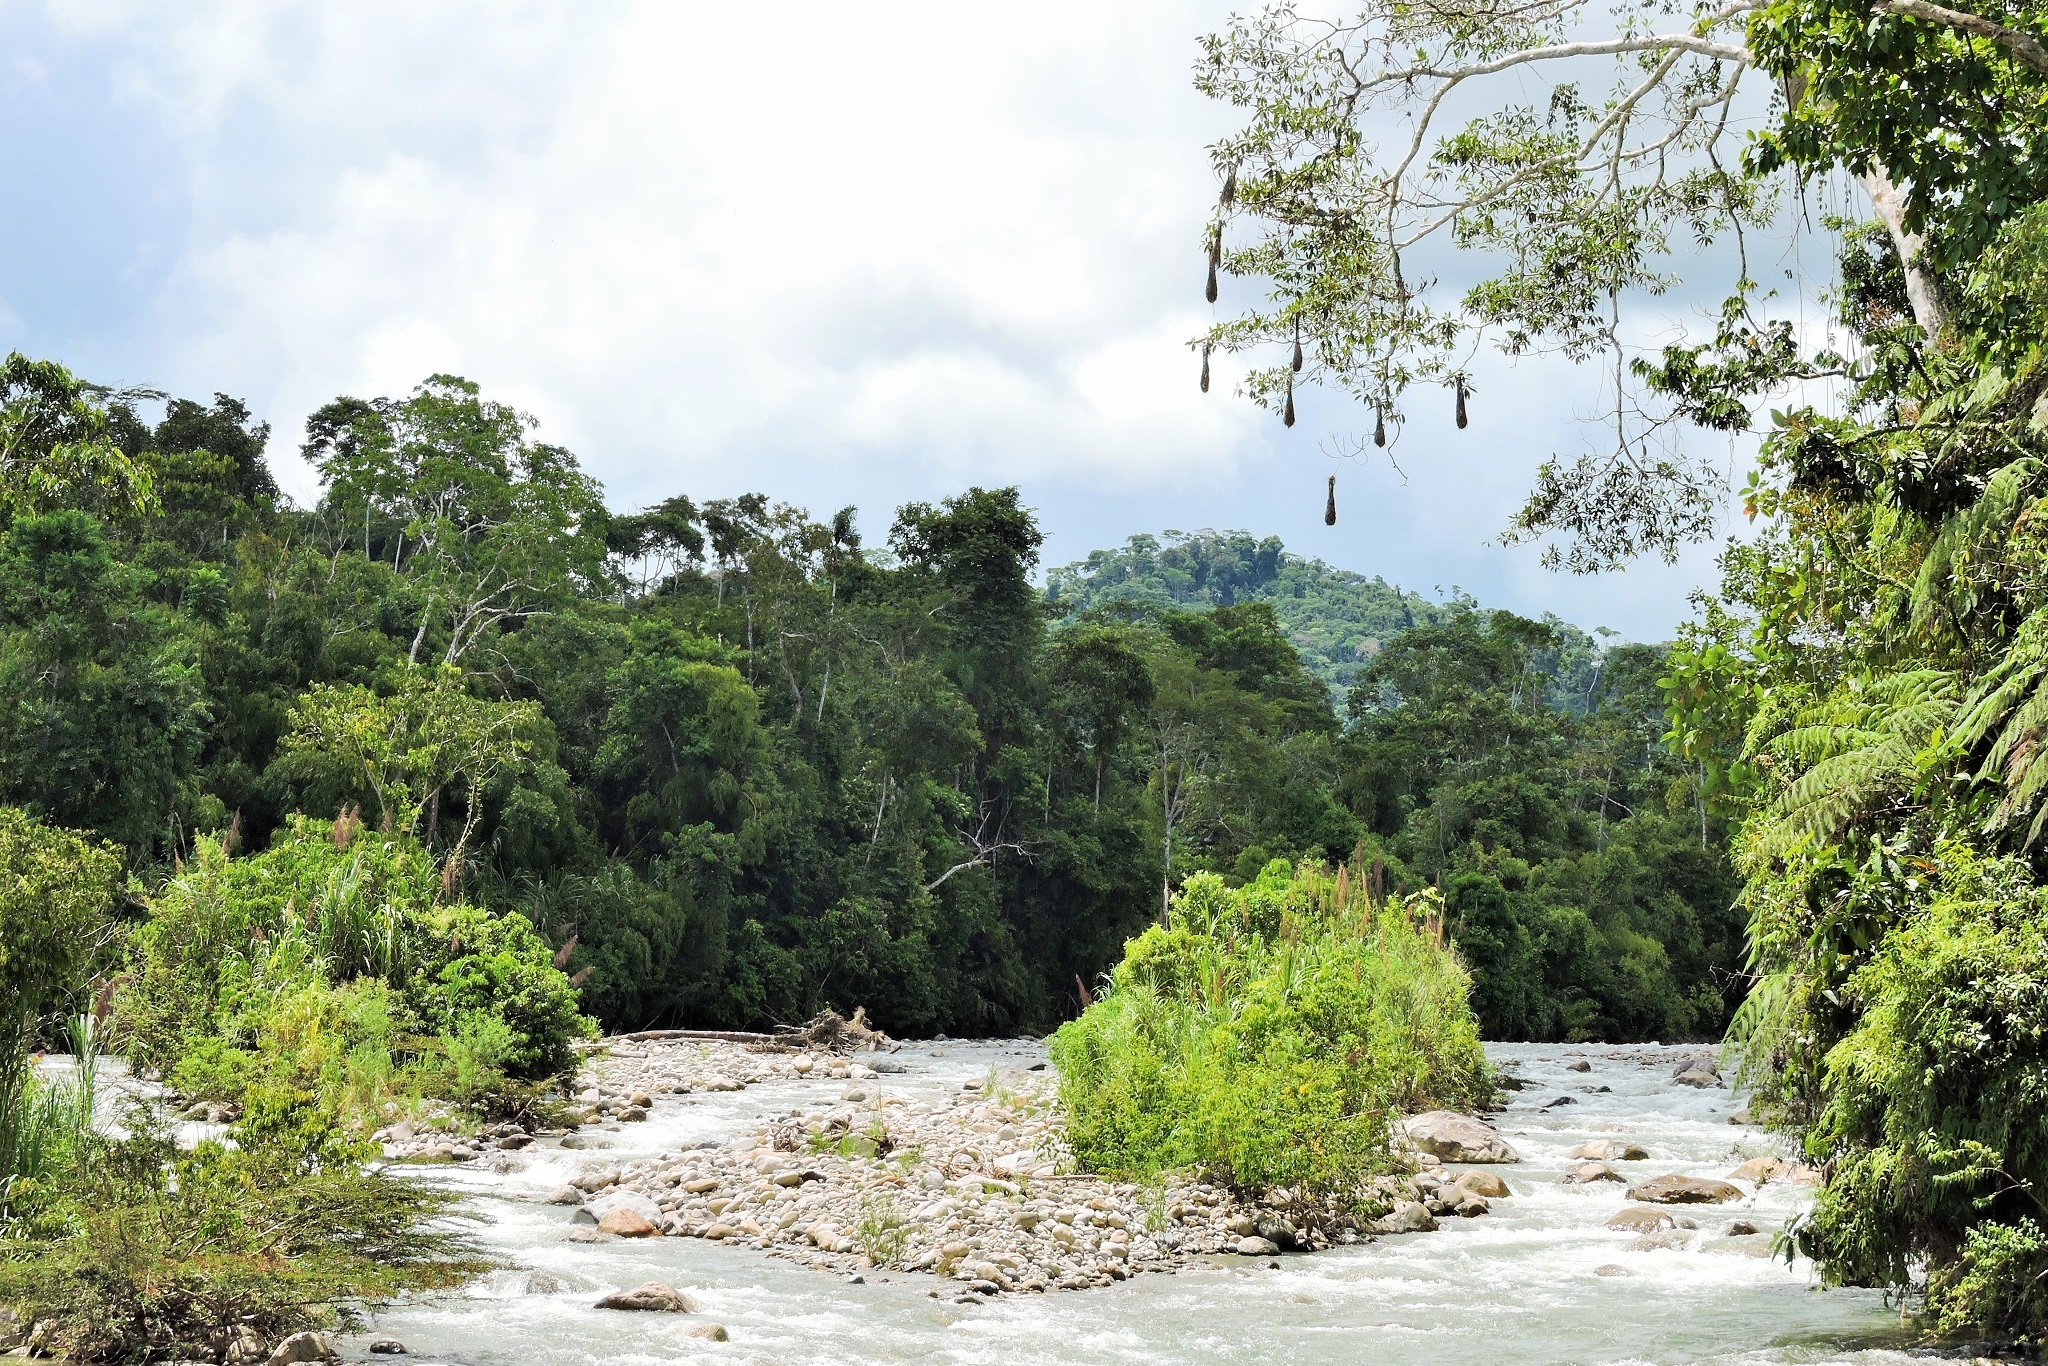 https://www.wildwatchperu.com/wp-content/uploads/2019/04/Guadalupe-river.jpg